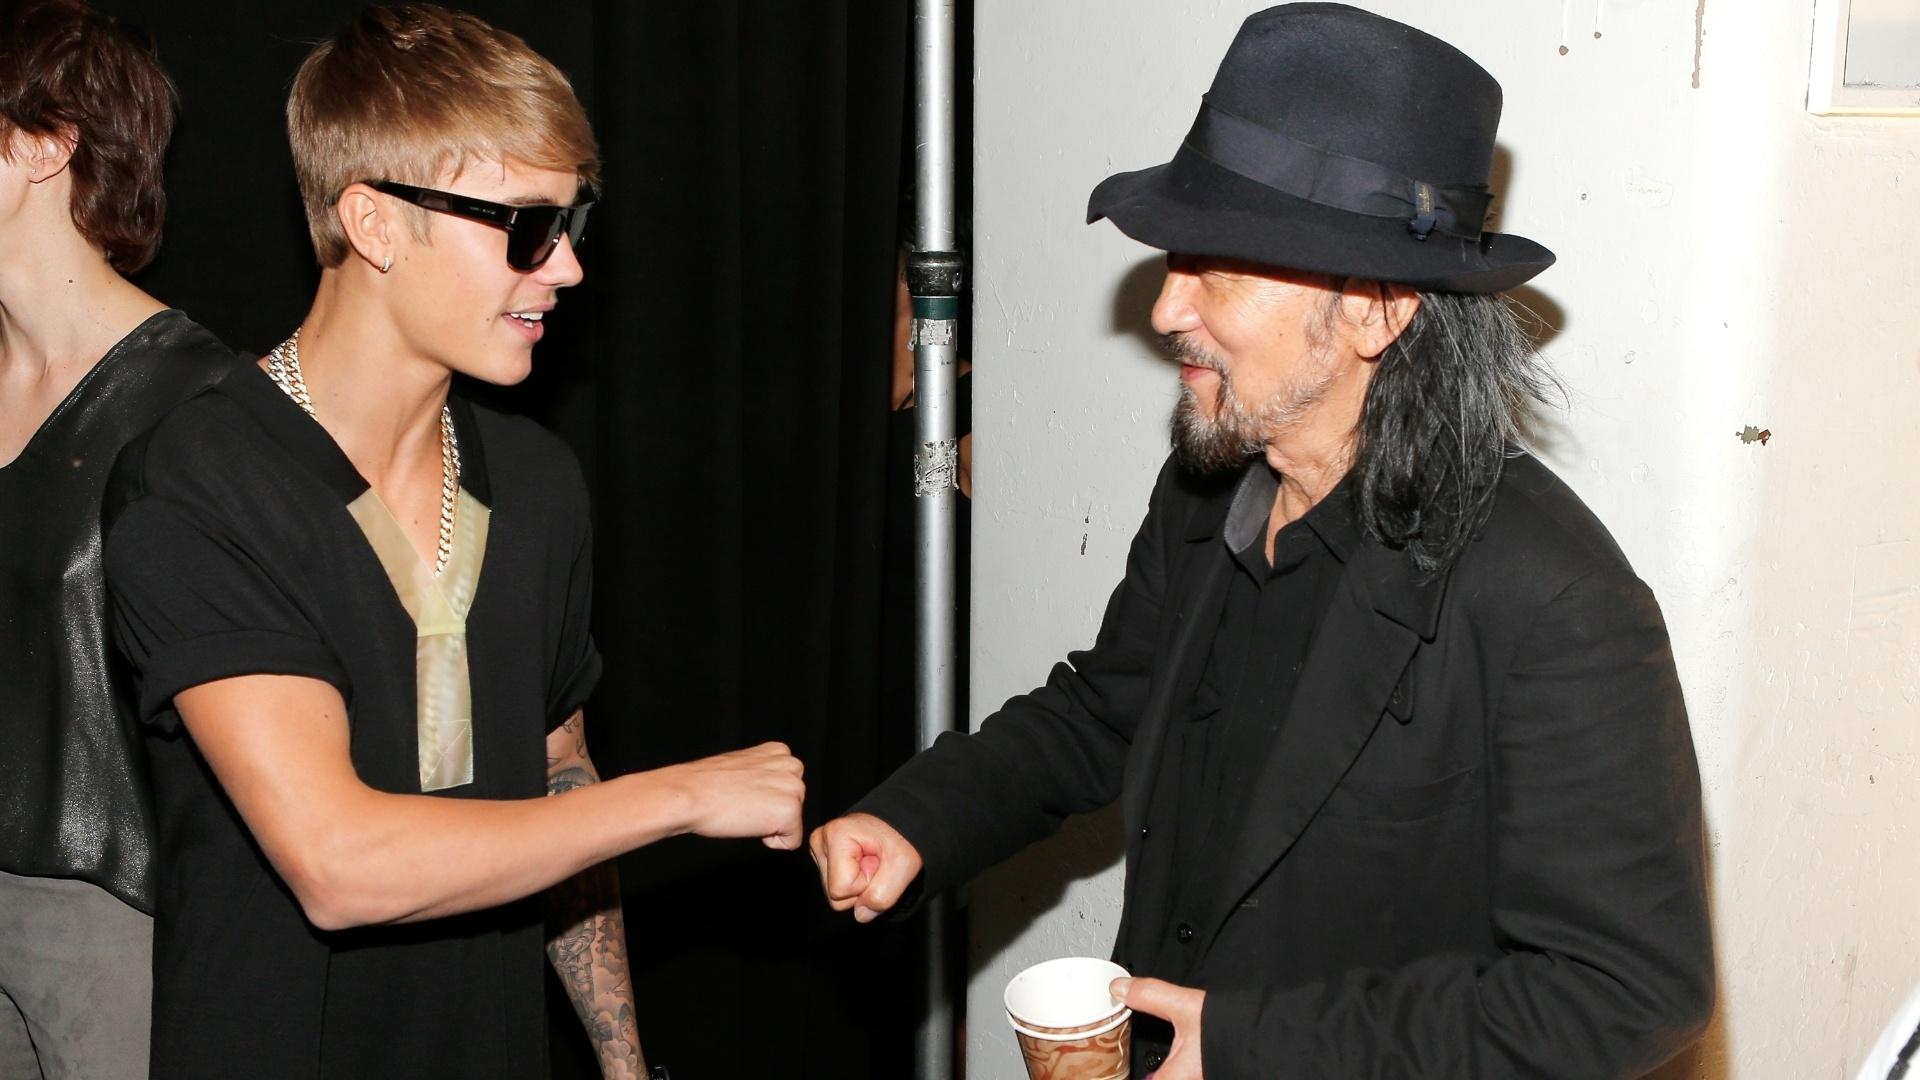 8.set.2013 - Justin Bieber conhece o estilista Yohji Yamamoto nos bastidores da Semana de Moda de Nova York